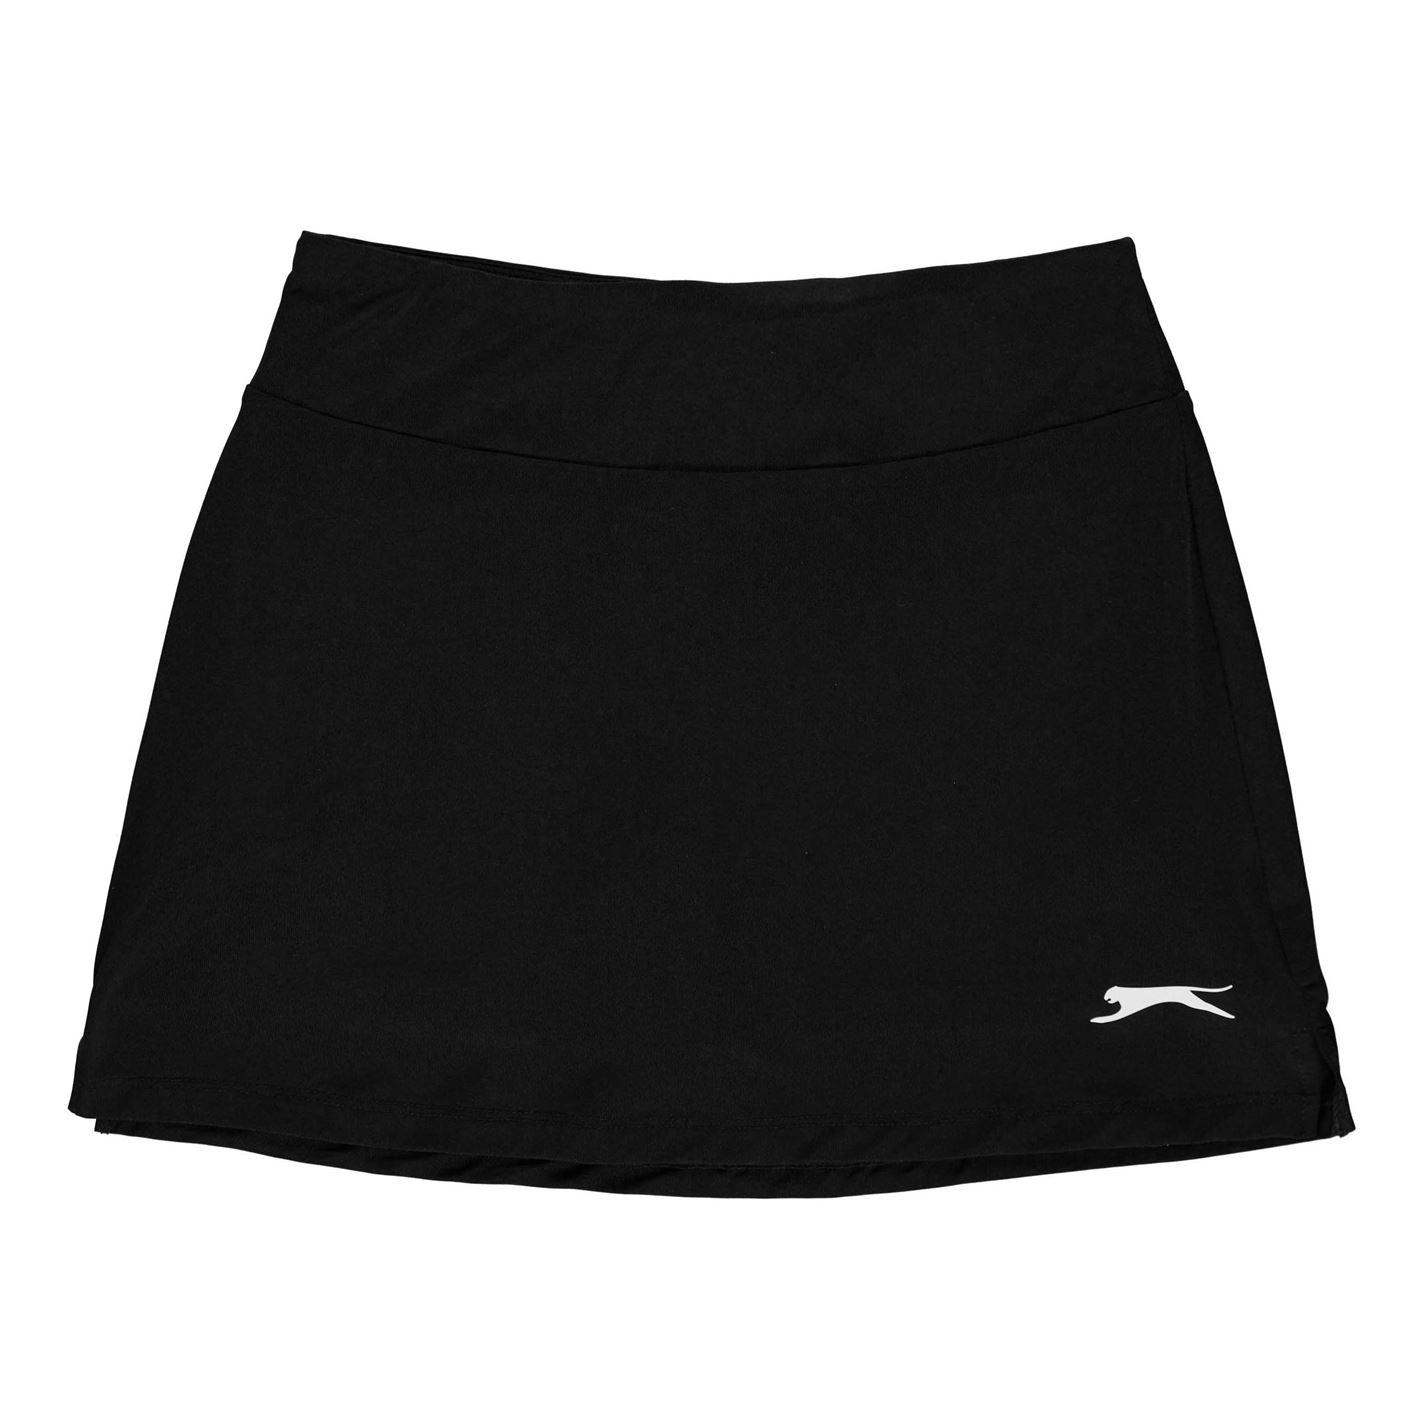 Fusta pantaloni Slazenger Court pentru fetite negru